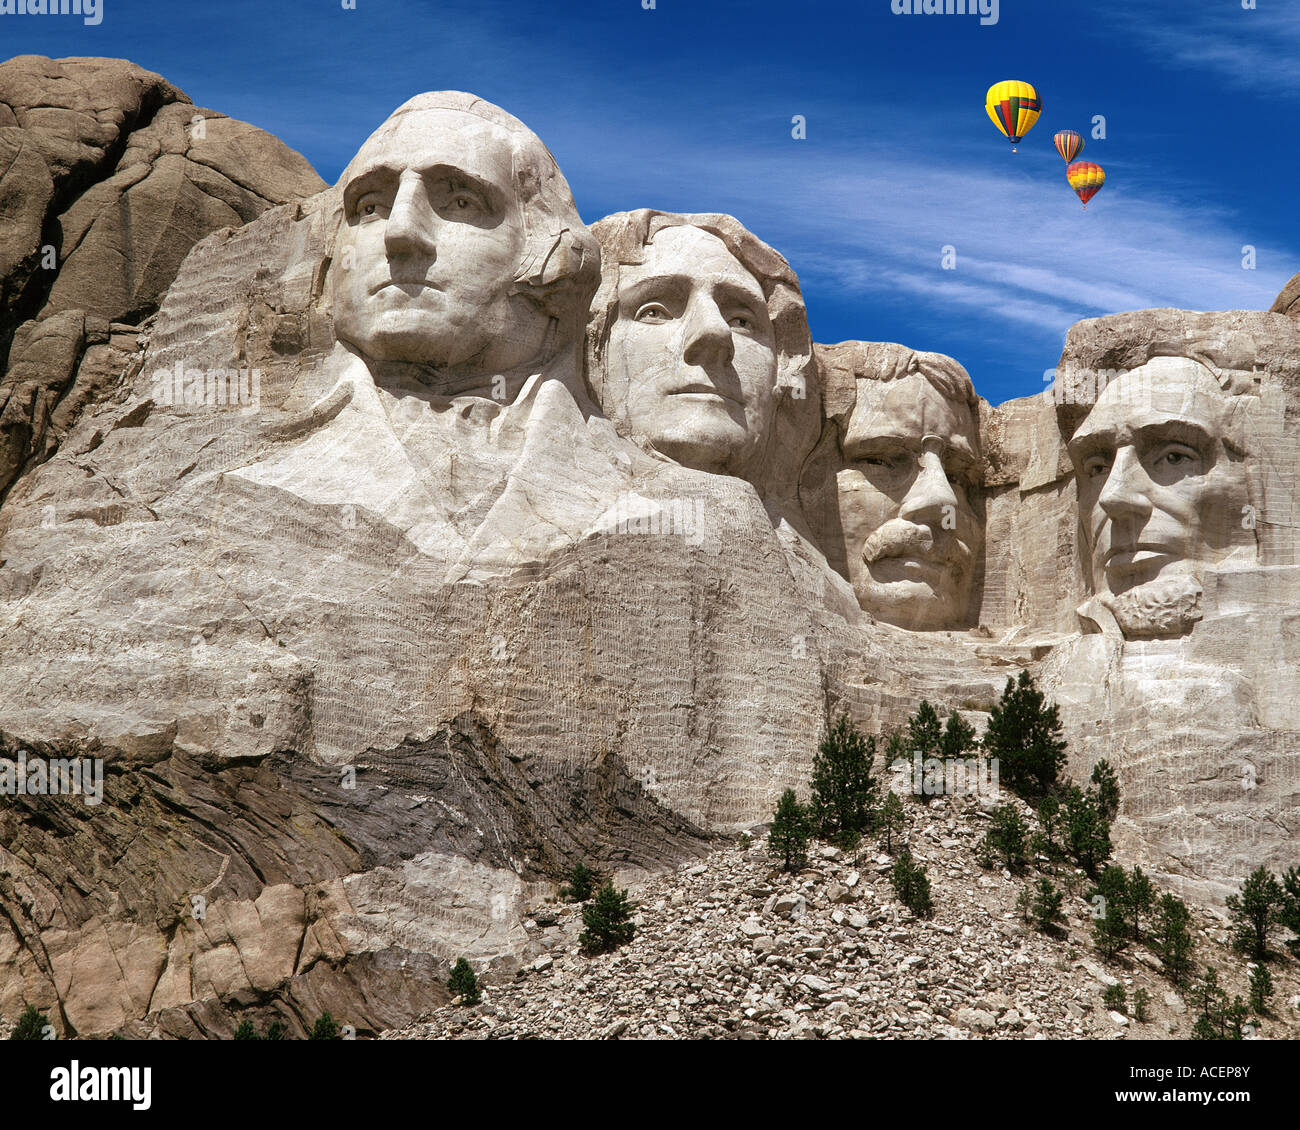 USA - SOUTH DAKOTA: Mount Rushmore National Memorial Stockfoto